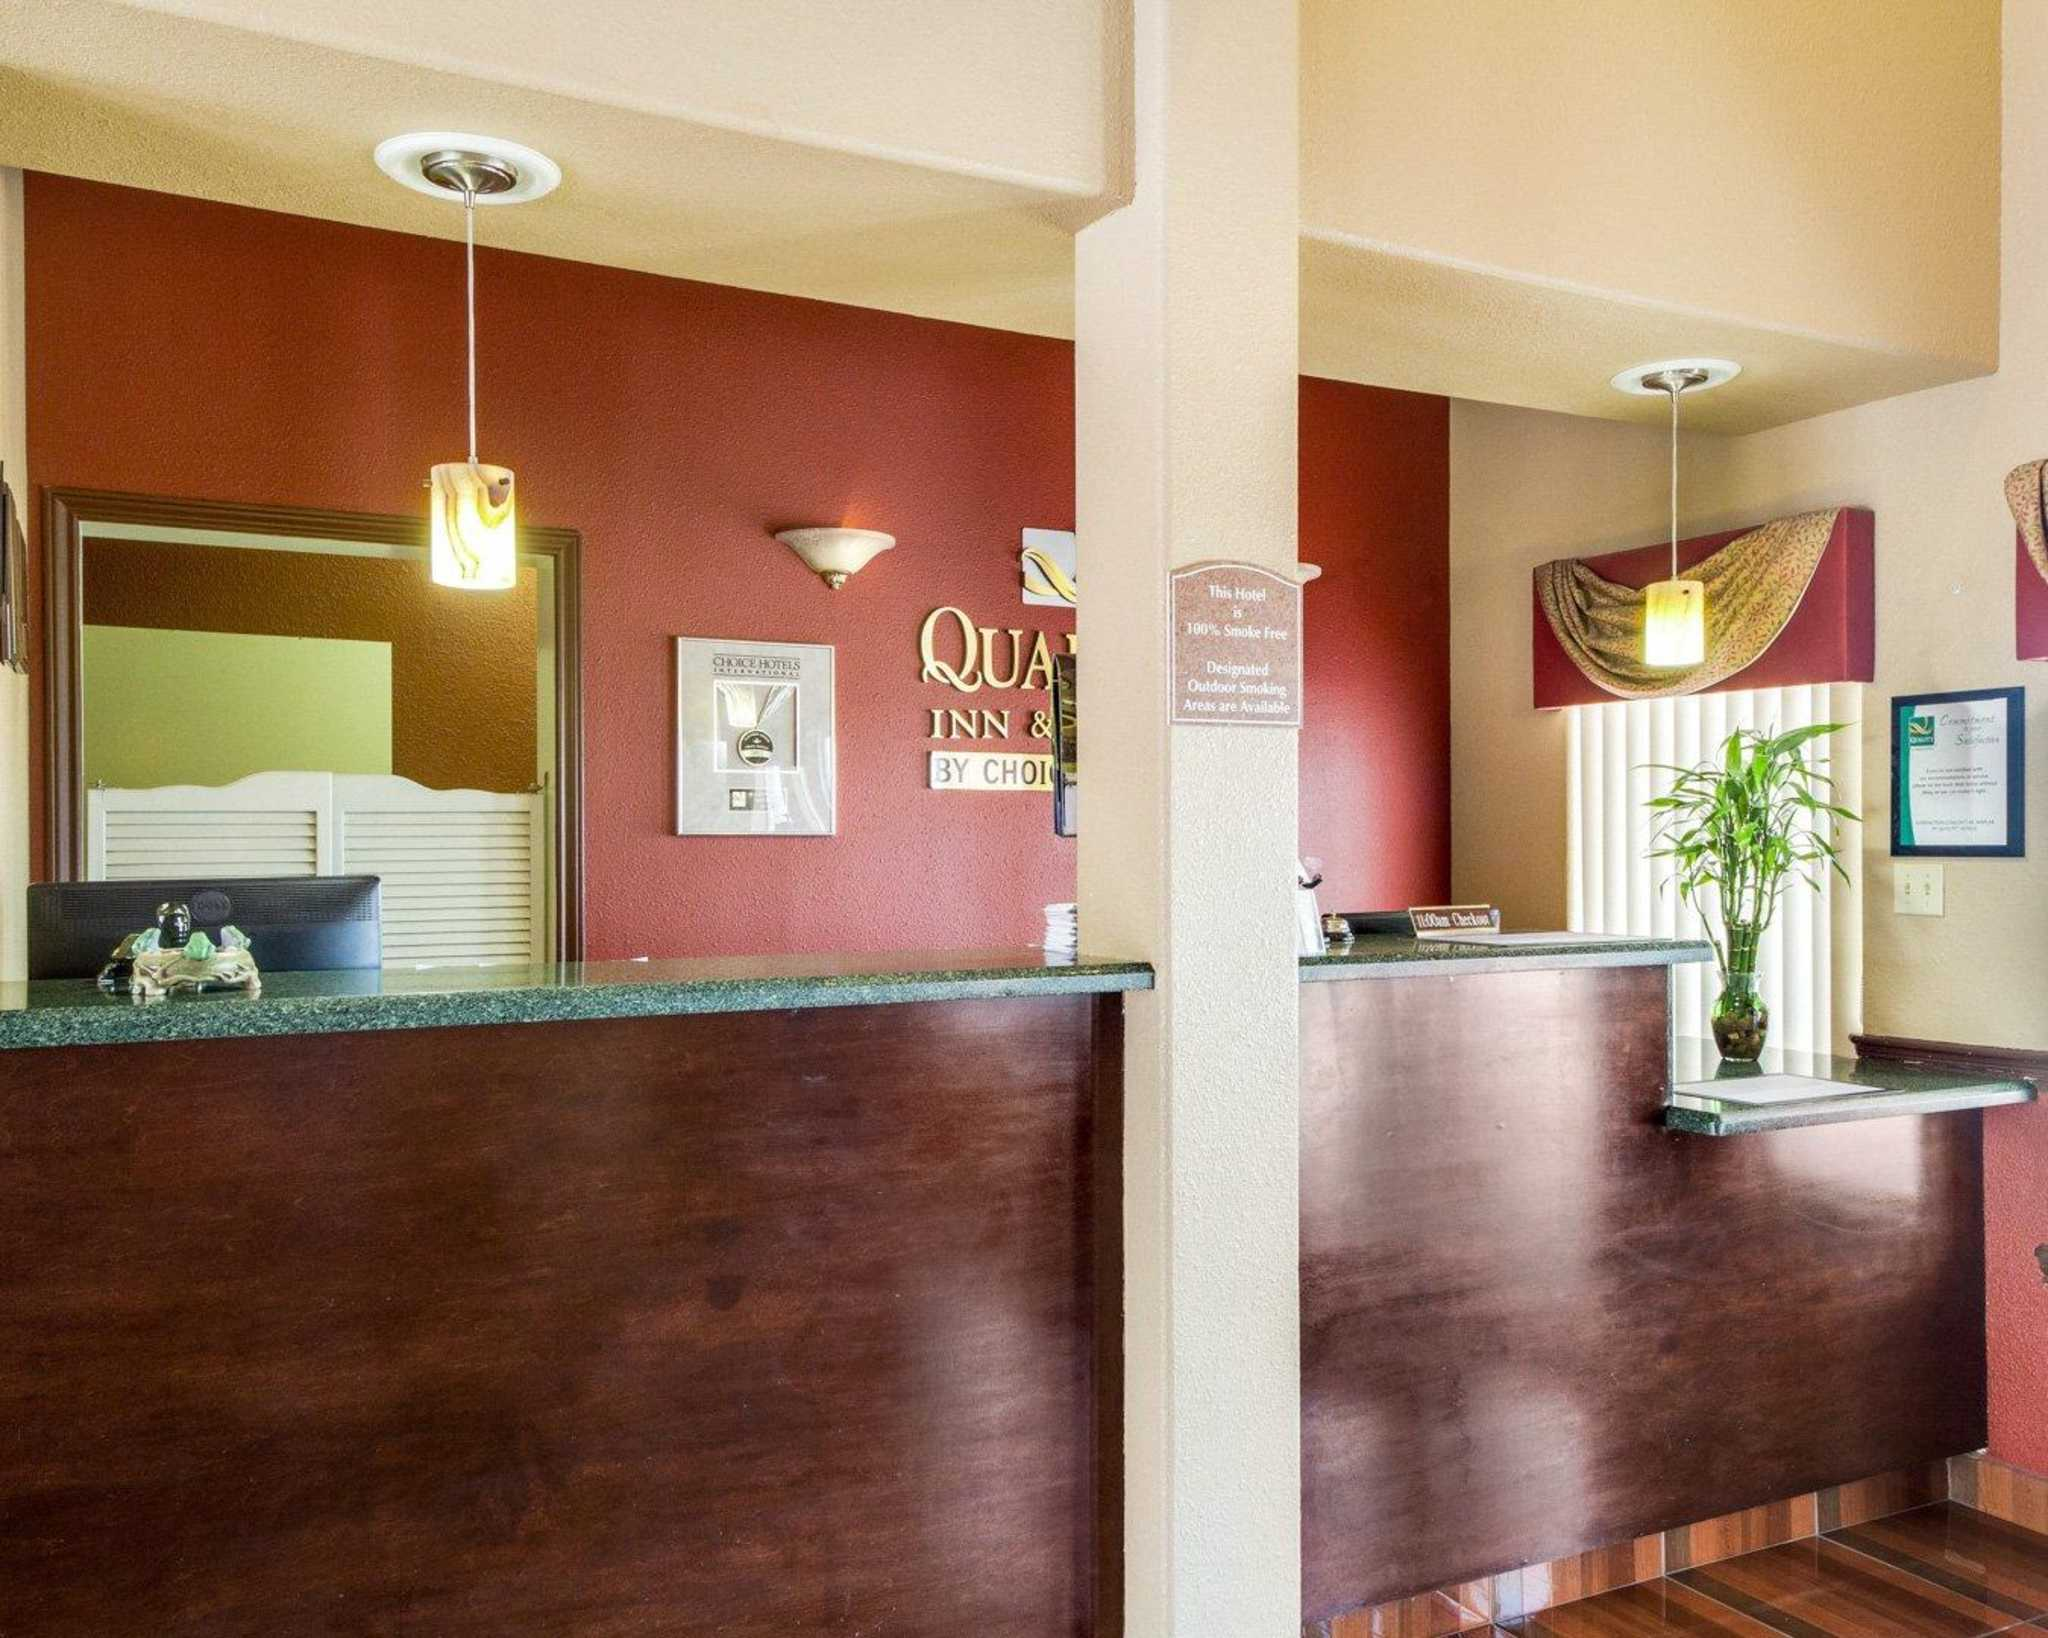 Quality Inn & Suites Eagle Pass image 10